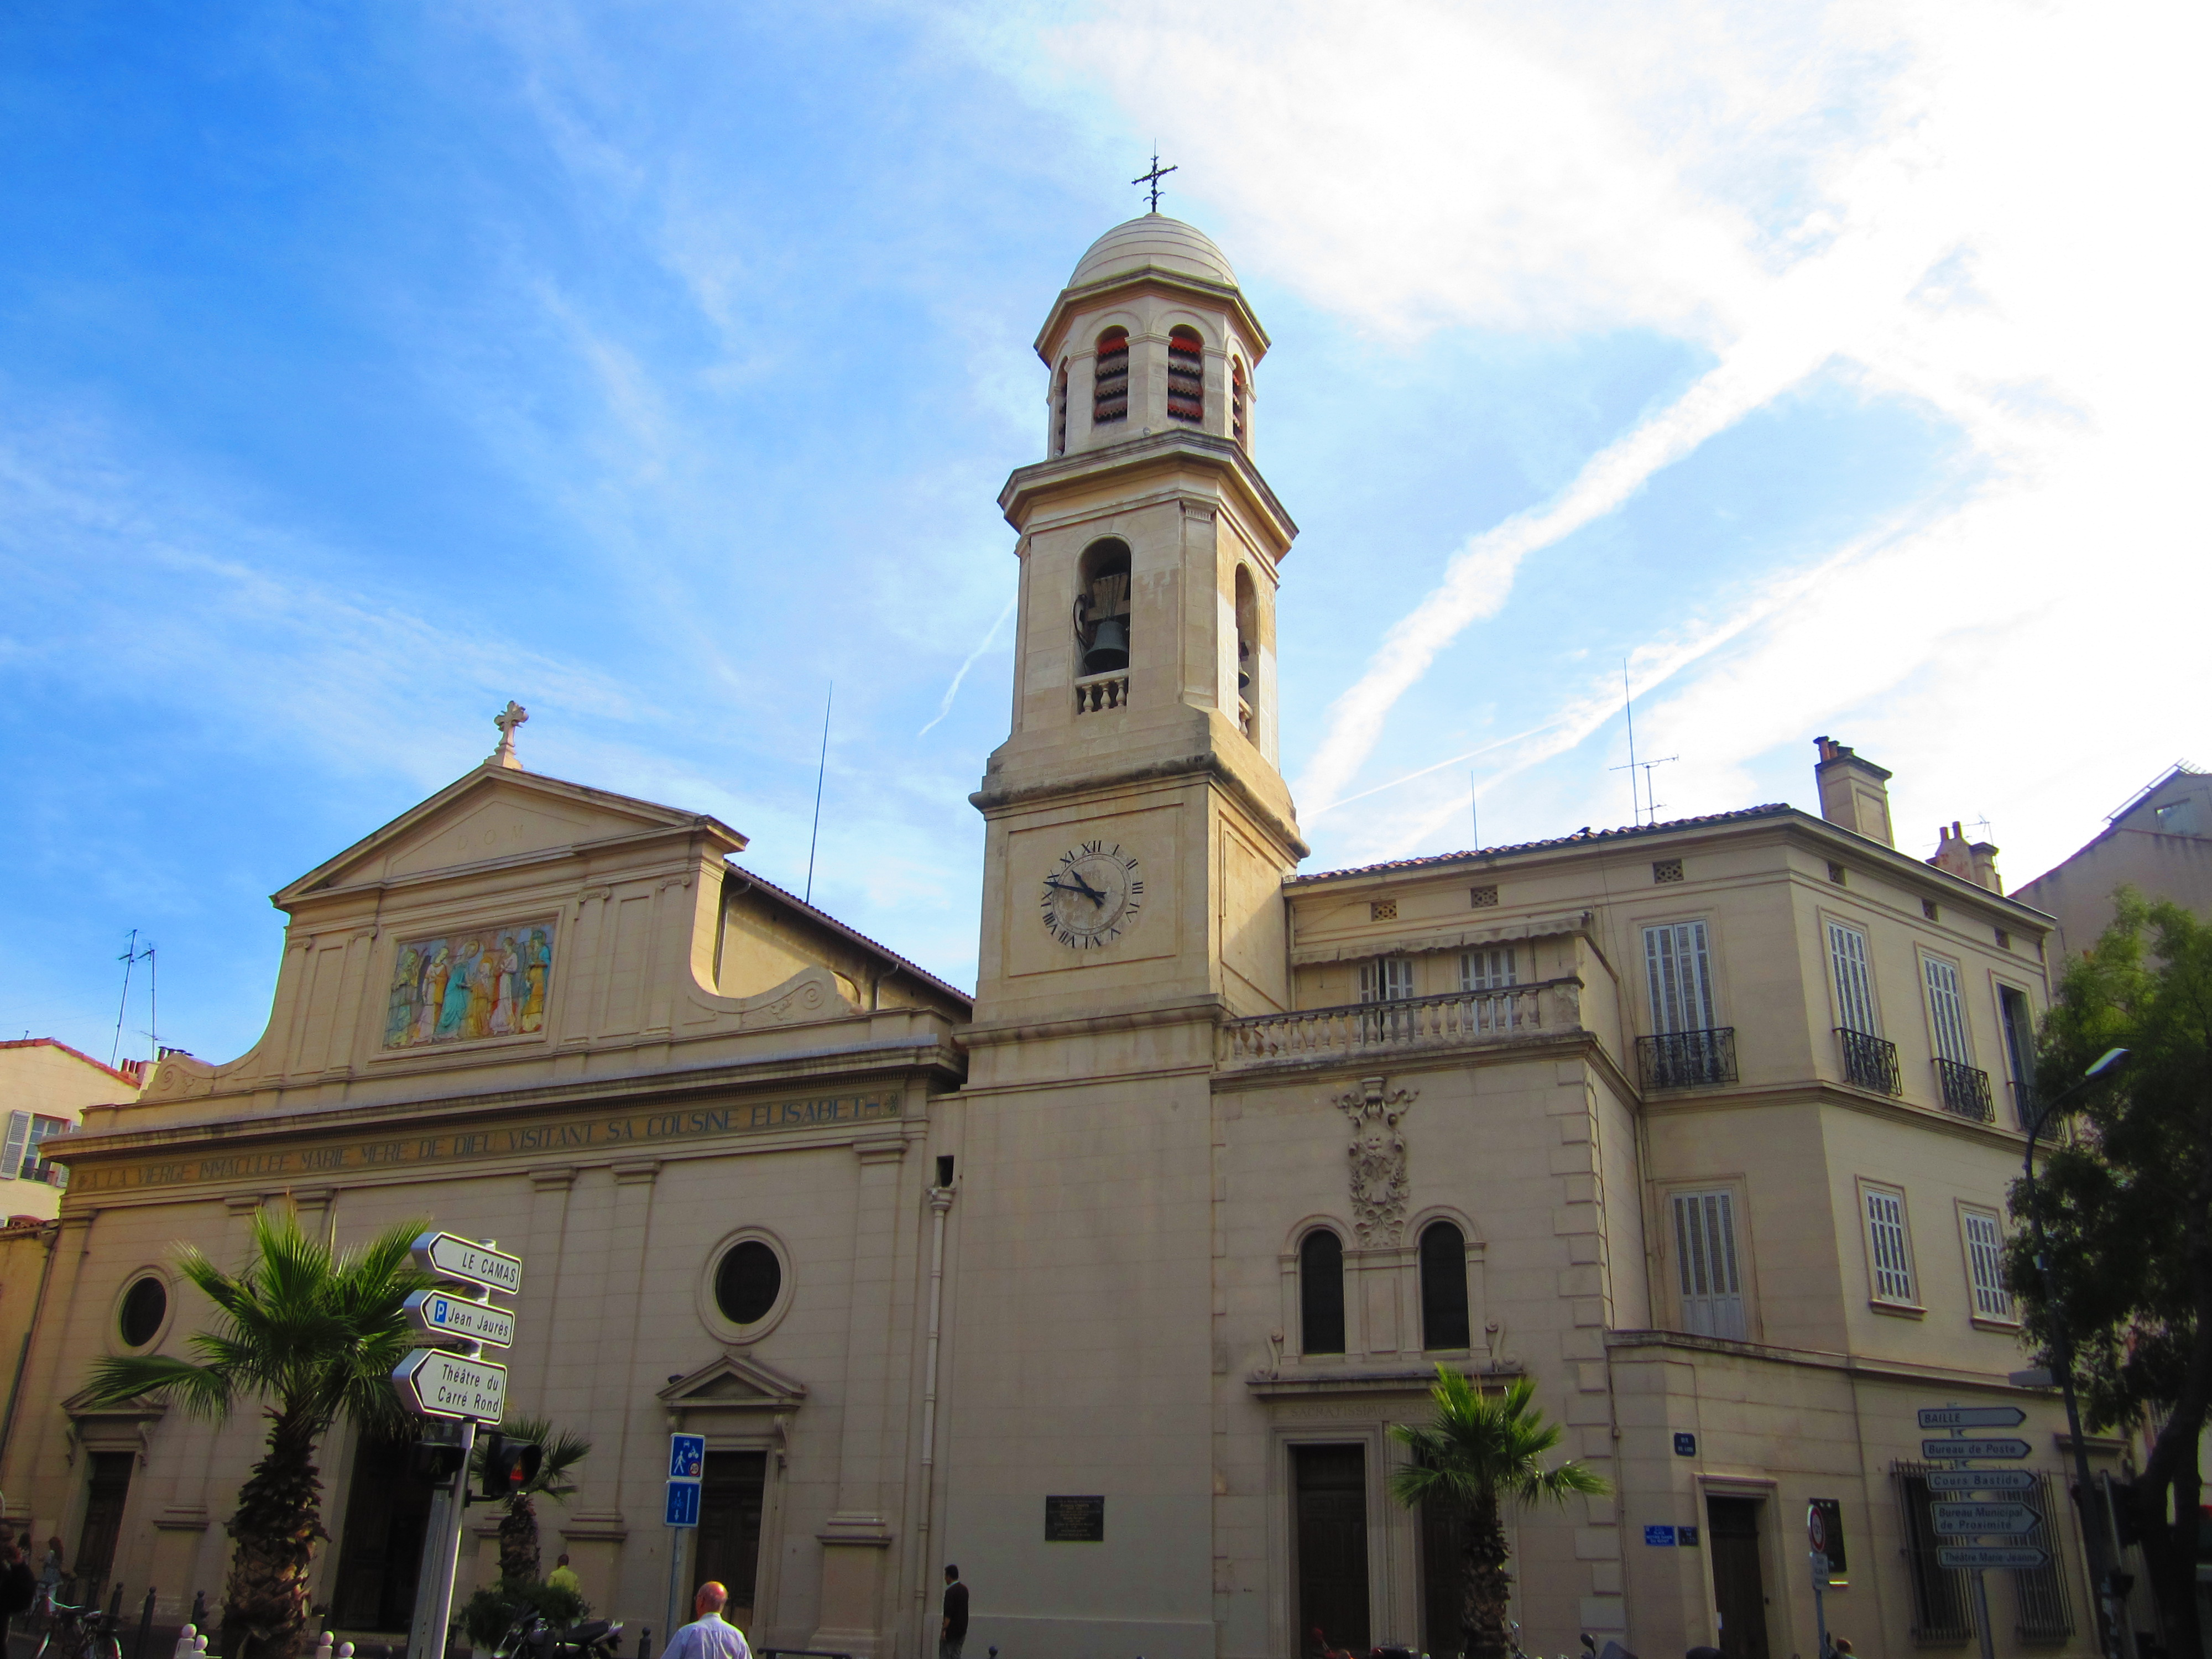 Marseille convention bureau atout france u französische zentrale